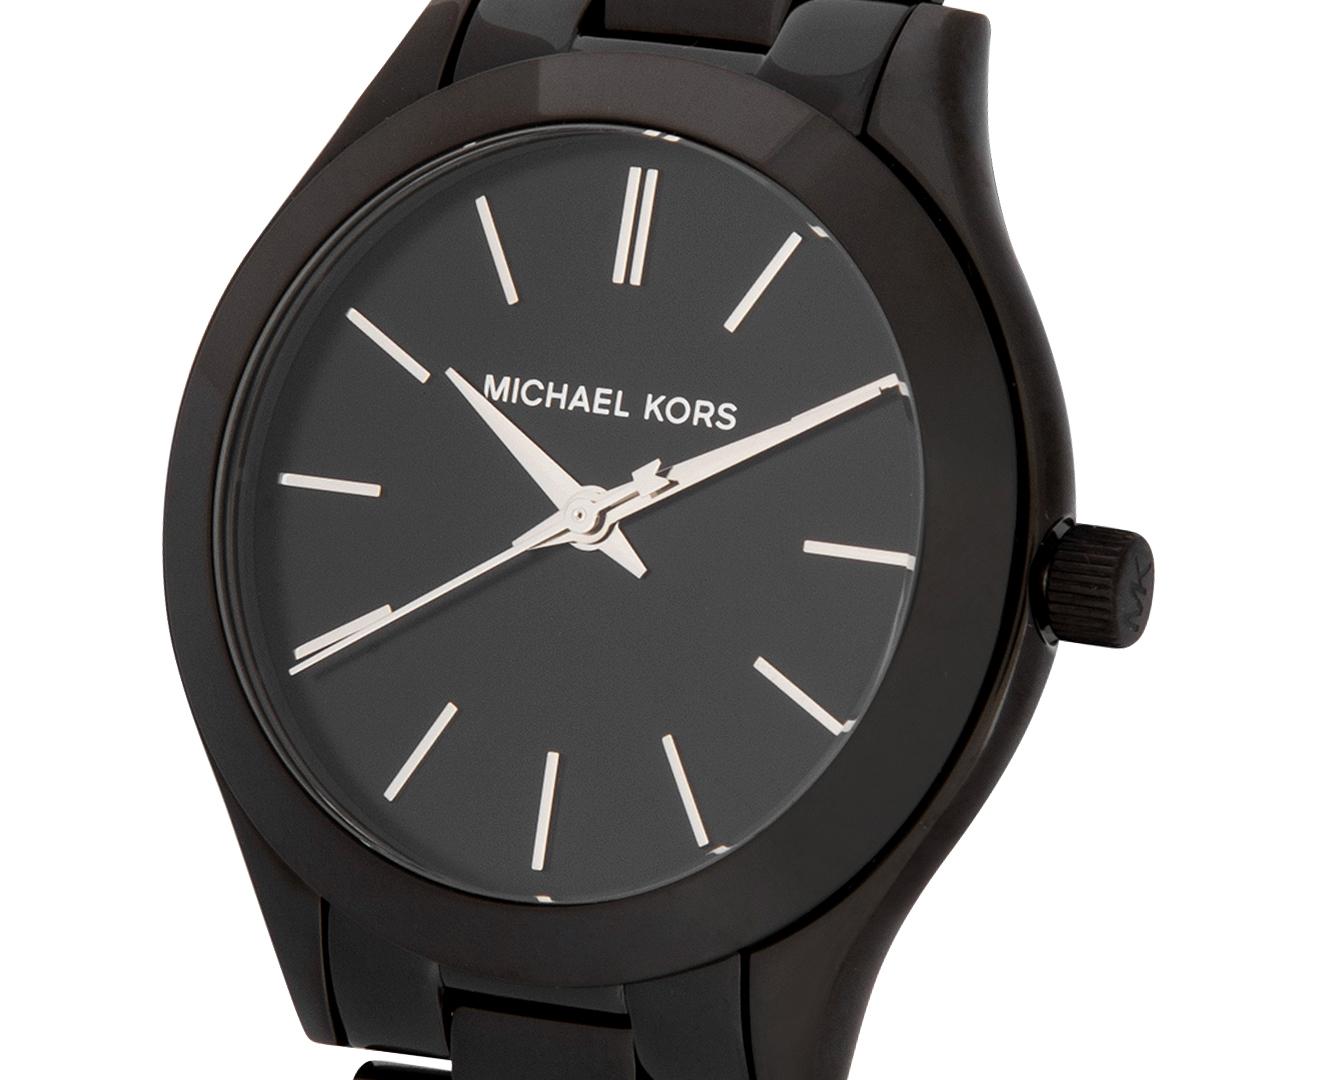 b119f76f9efb Michael Kors Women s 34mm Mini Slim Runway Stainless Steel Watch - Black